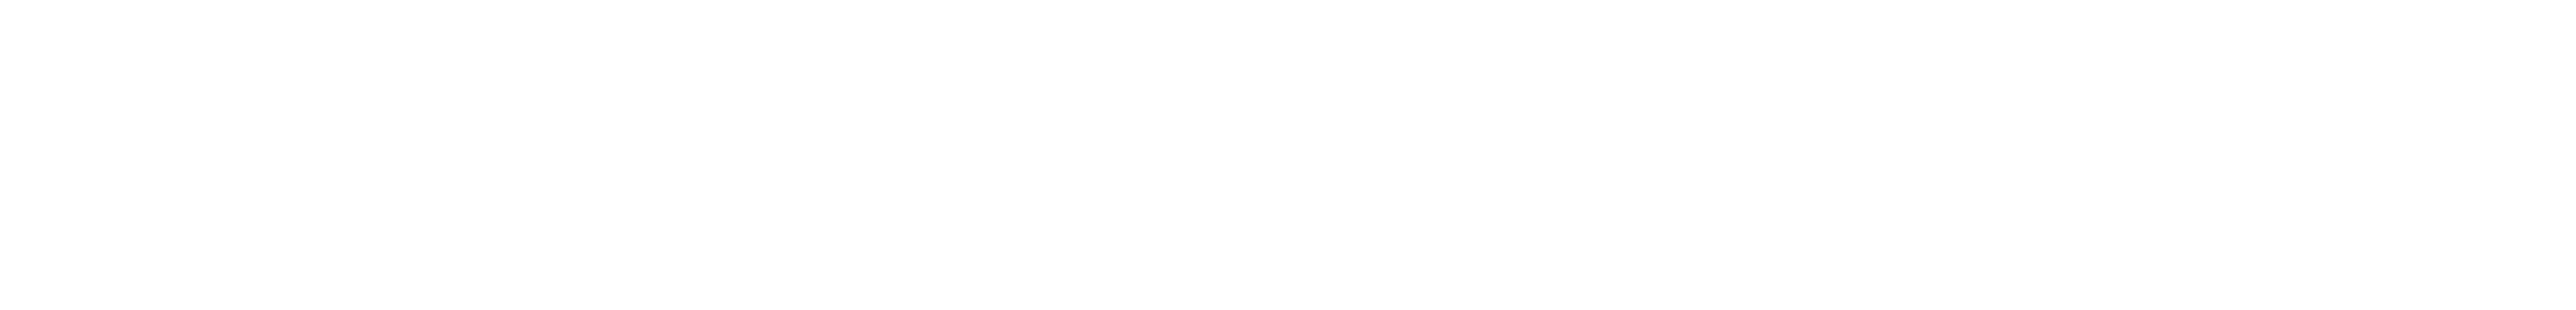 Cumbernauld Amateur Athletics Club